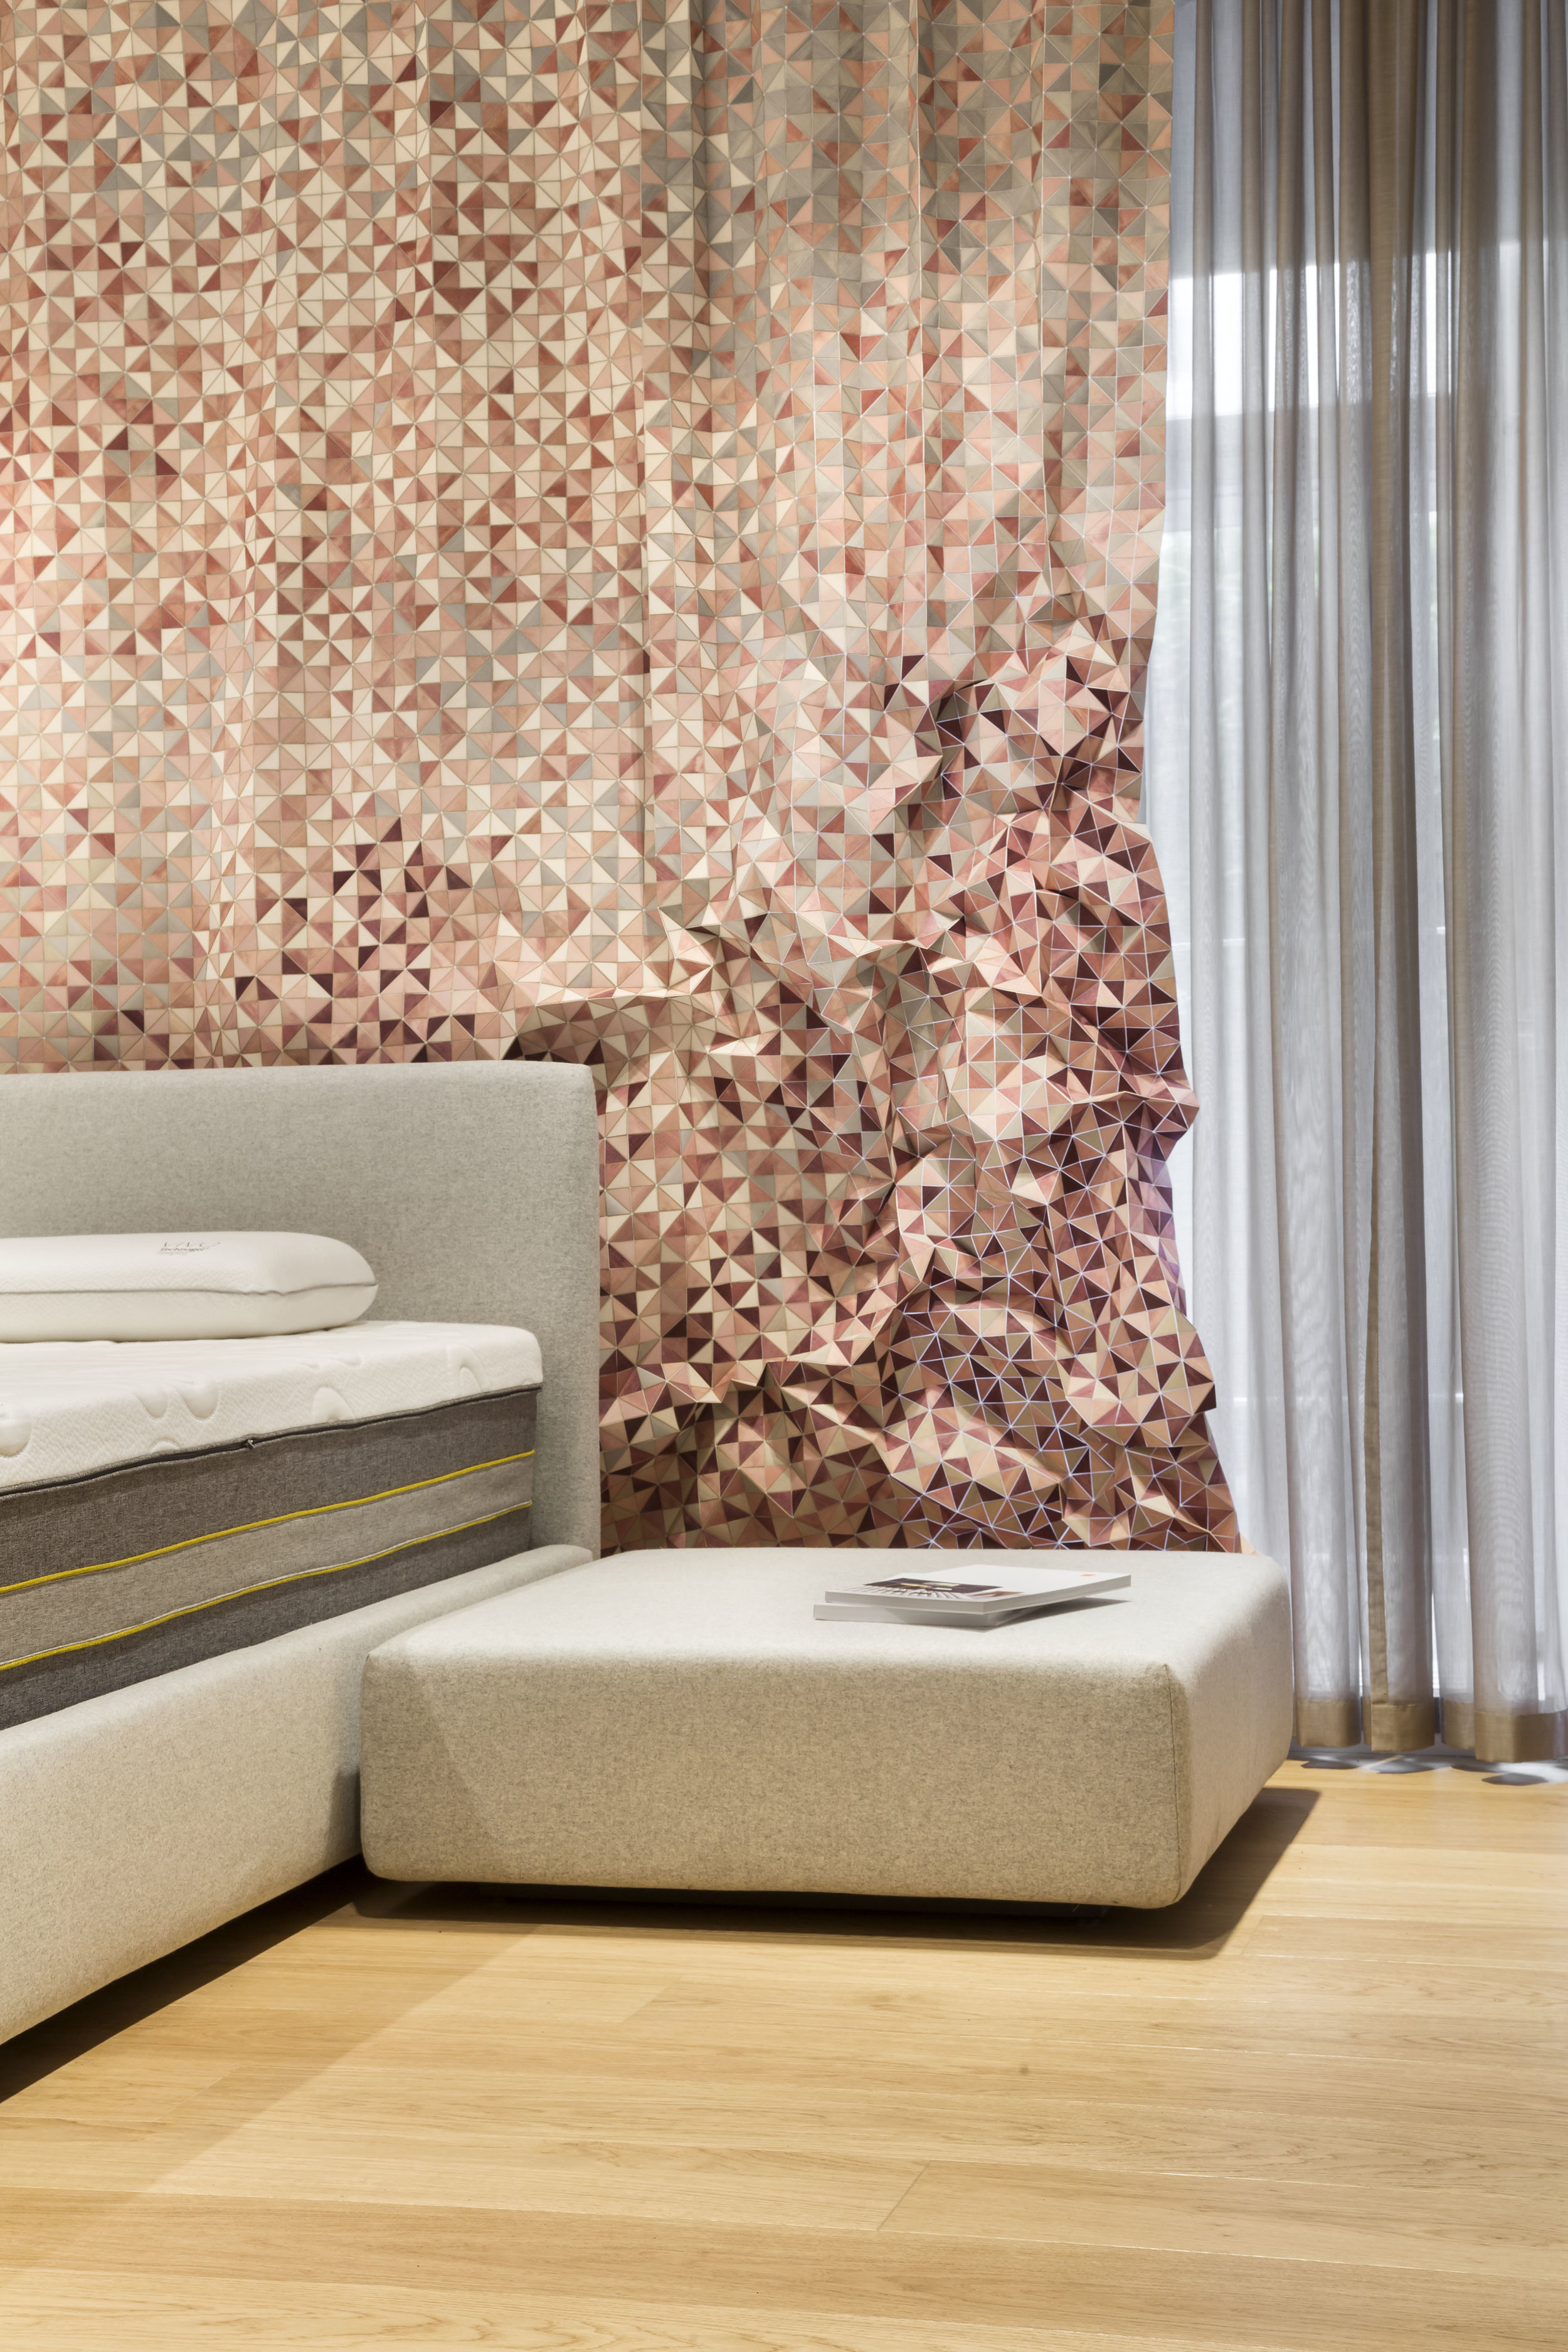 technogel-experience-center_retail-interior-design_coordination-berlin_09.jpg